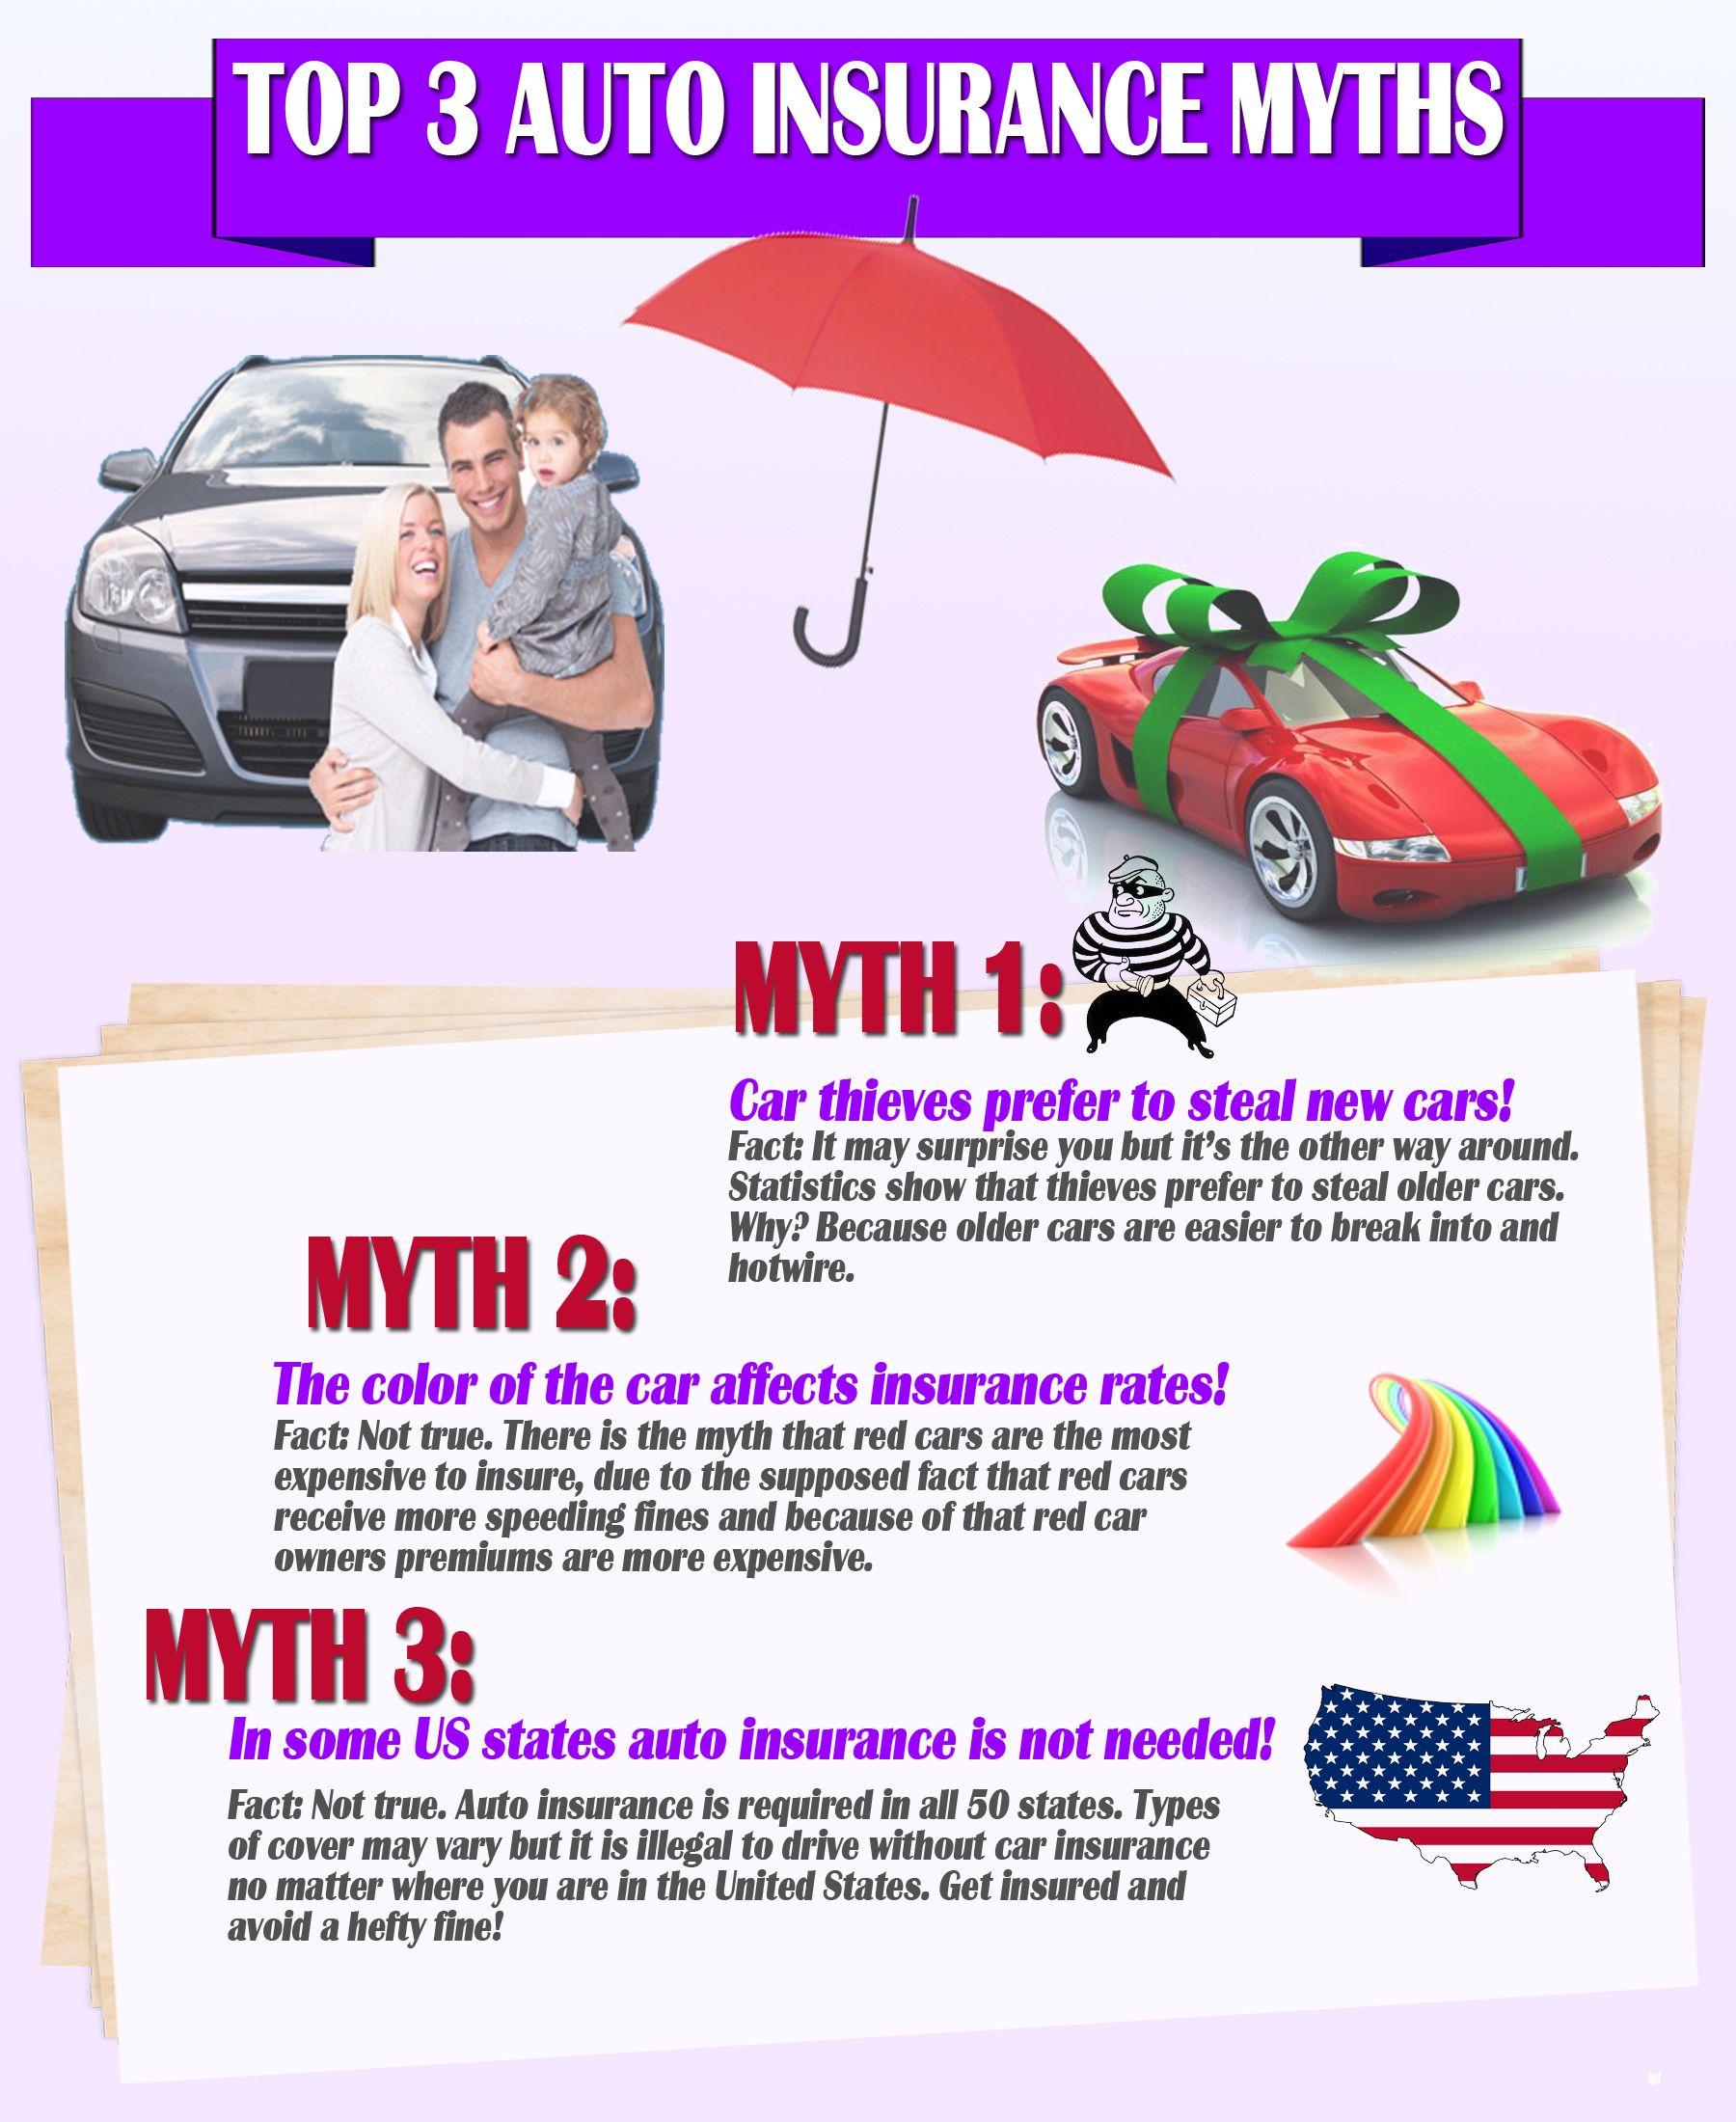 Vehicleinsuranceft Lauderdale Auto Insurance Myths Car Insurance